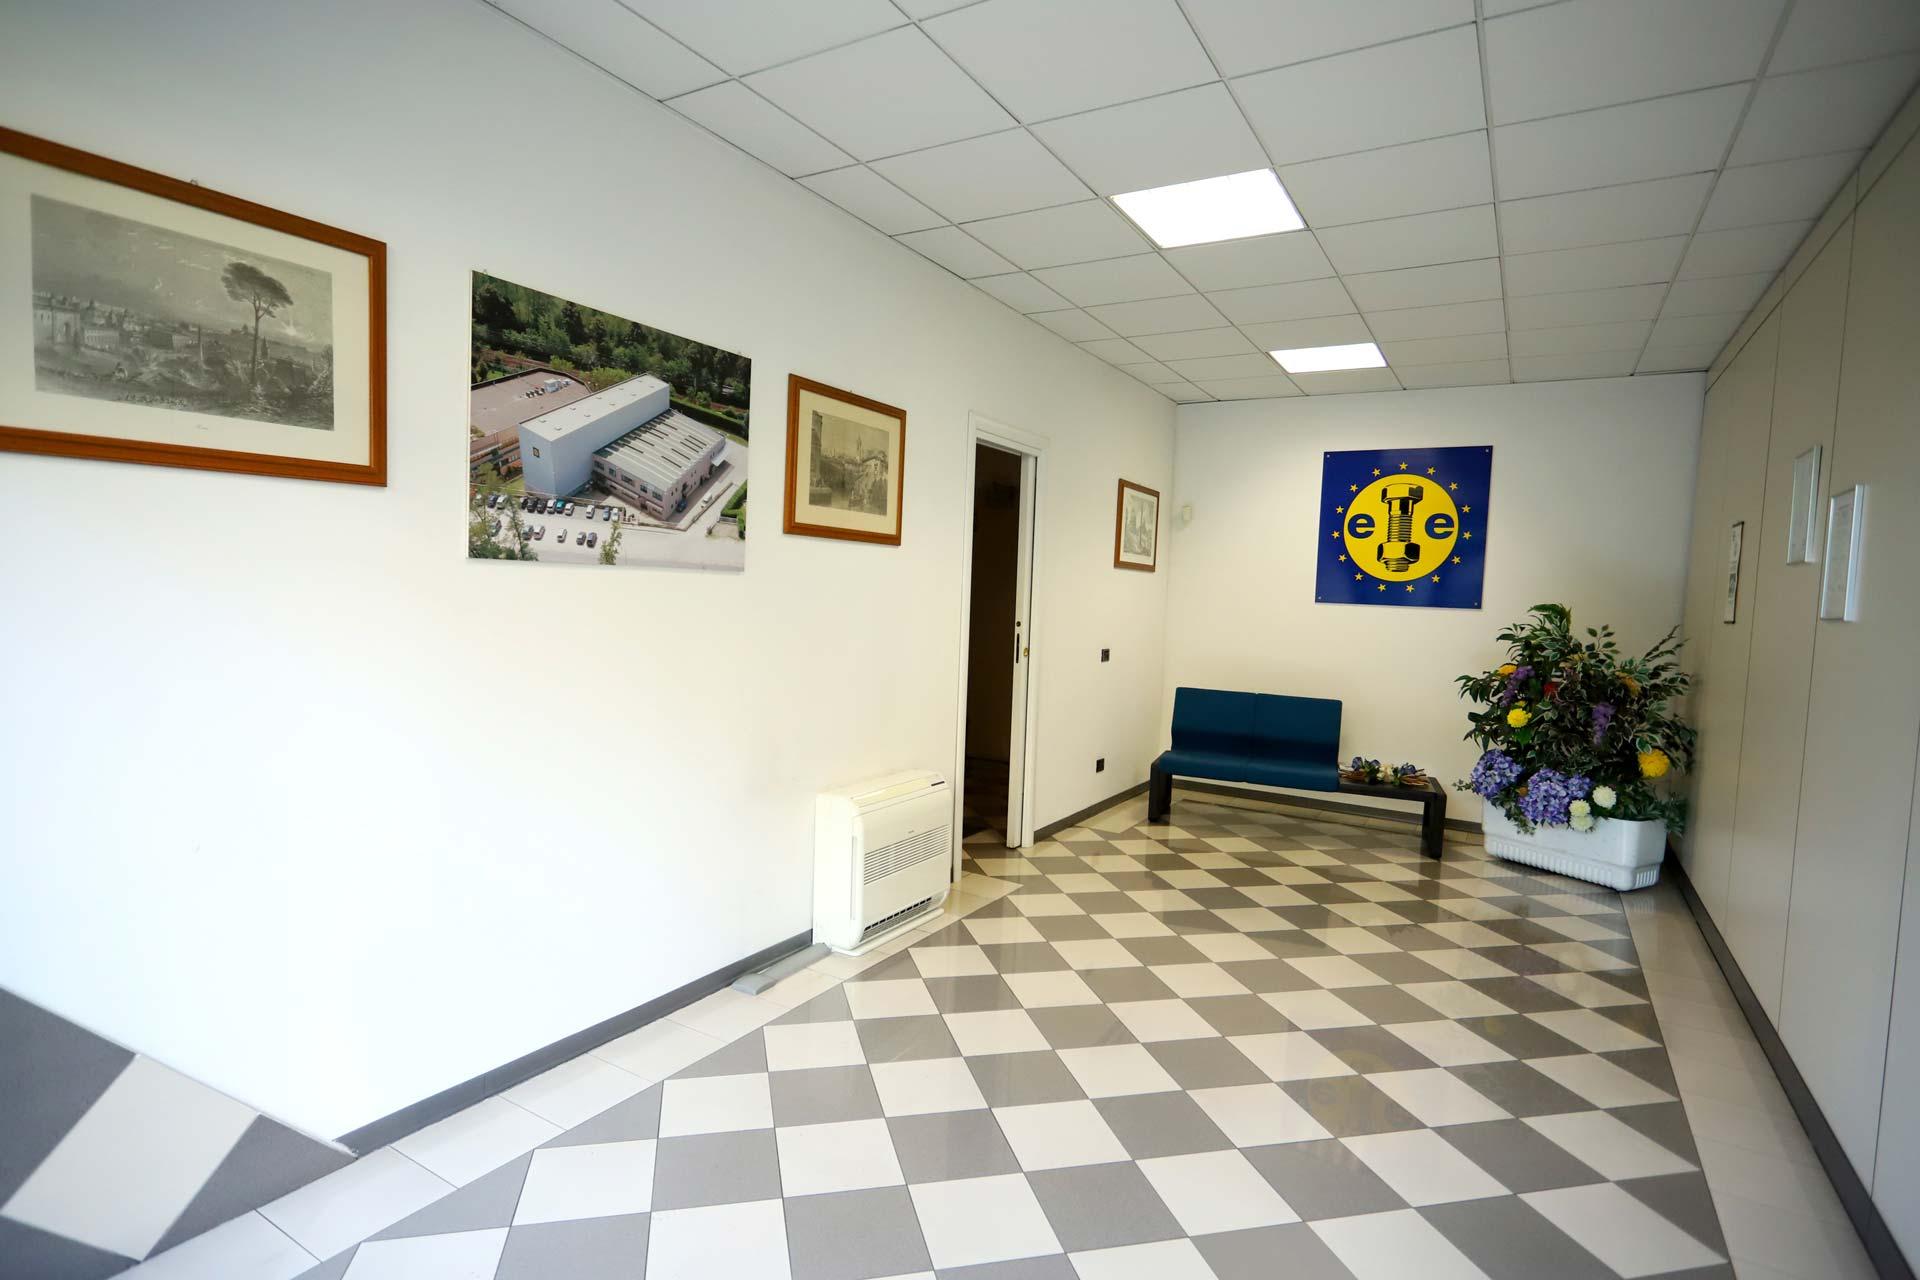 1980 - 2020